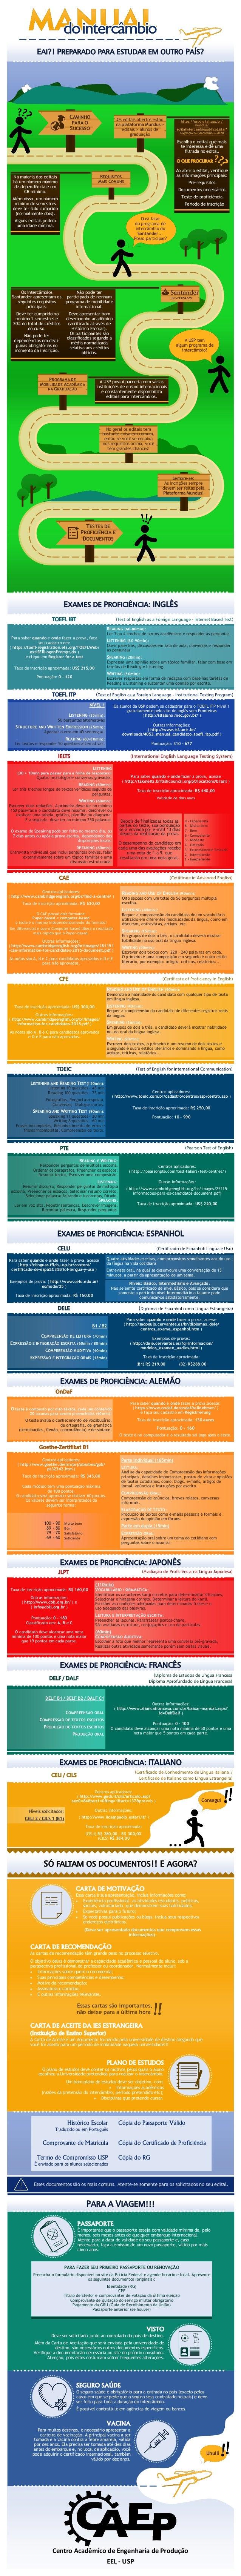 TOEFL IBT READING (60-80min): Ler 3 ou 4 trechos de textos acadêmicos e responder as perguntas. LISTENING (60-90min): Ouvi...